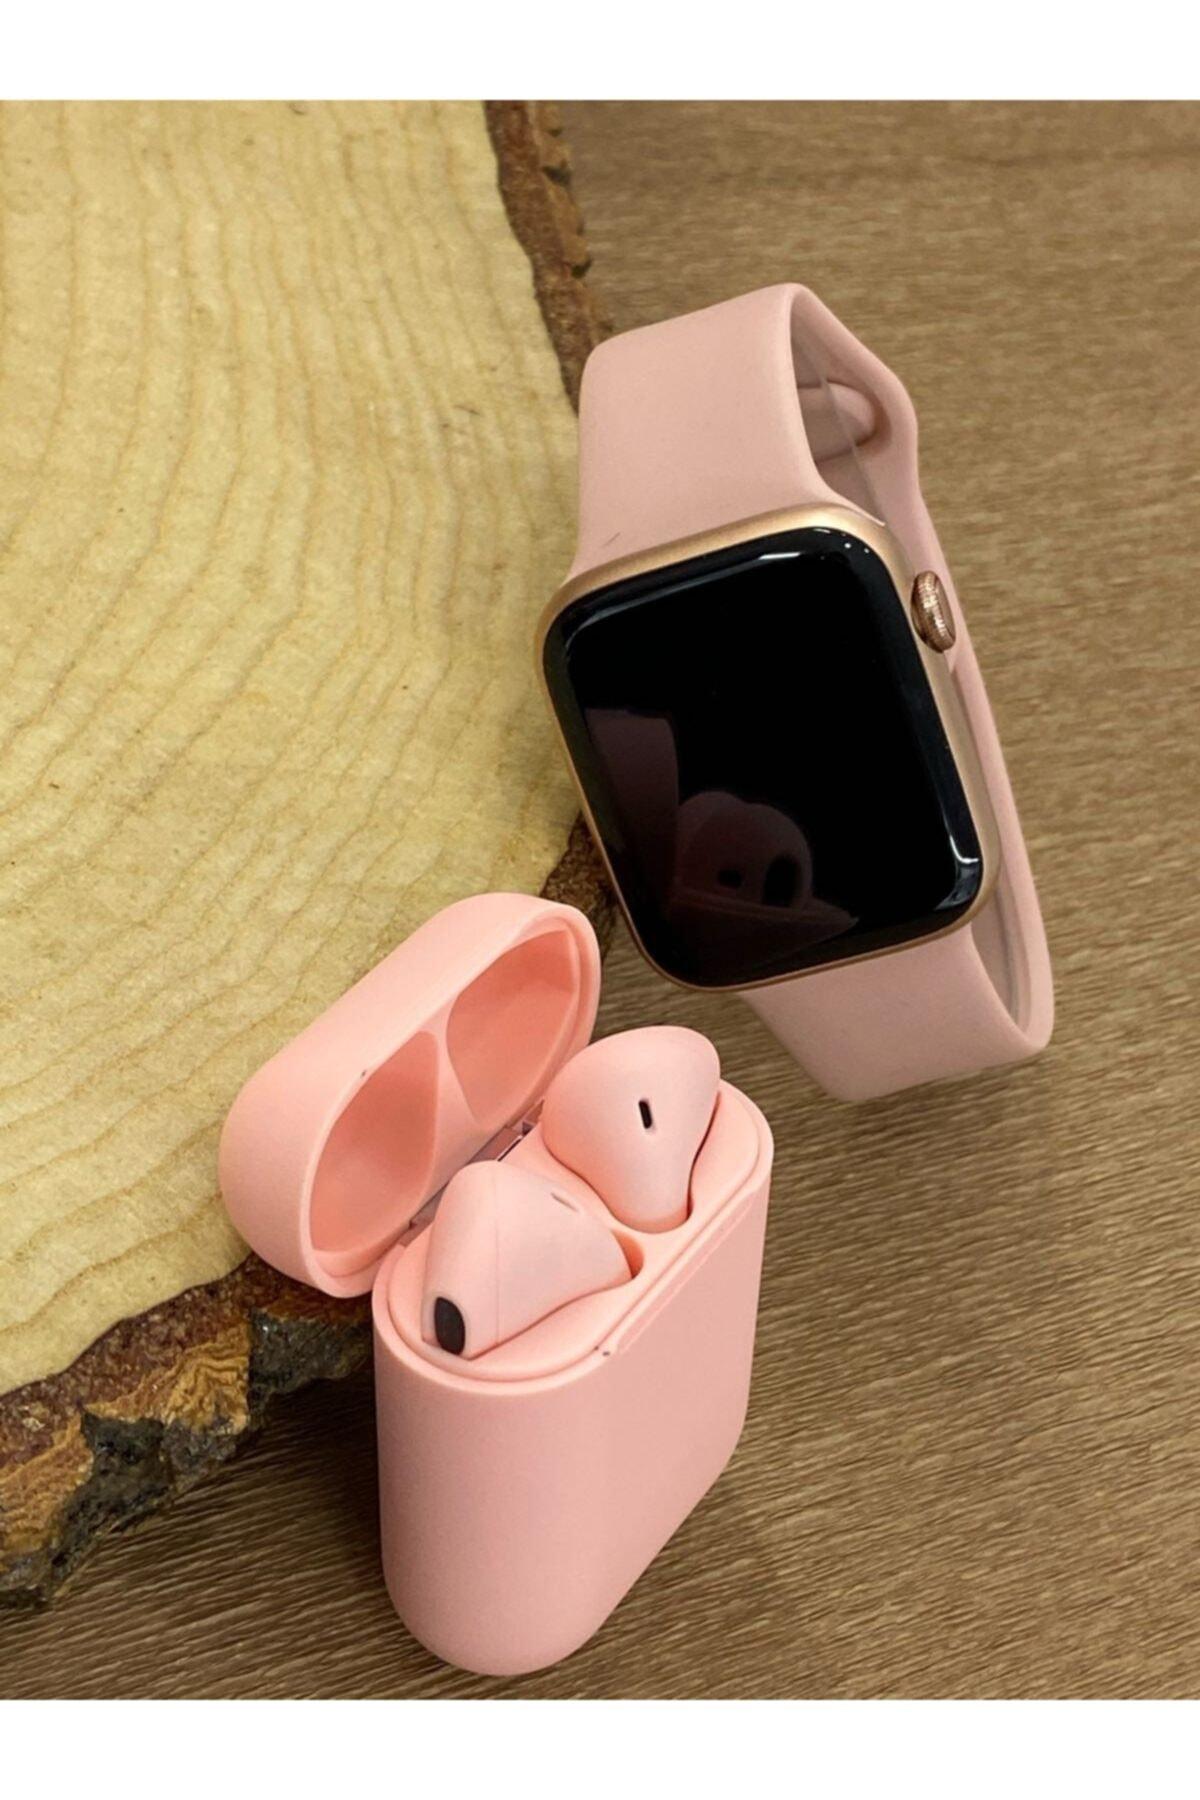 FERRO Watch 6 Plus Enson Seri 2021 Bluetooth Kulaklık Hediyeli Android Ve Ios Uyumlu 2